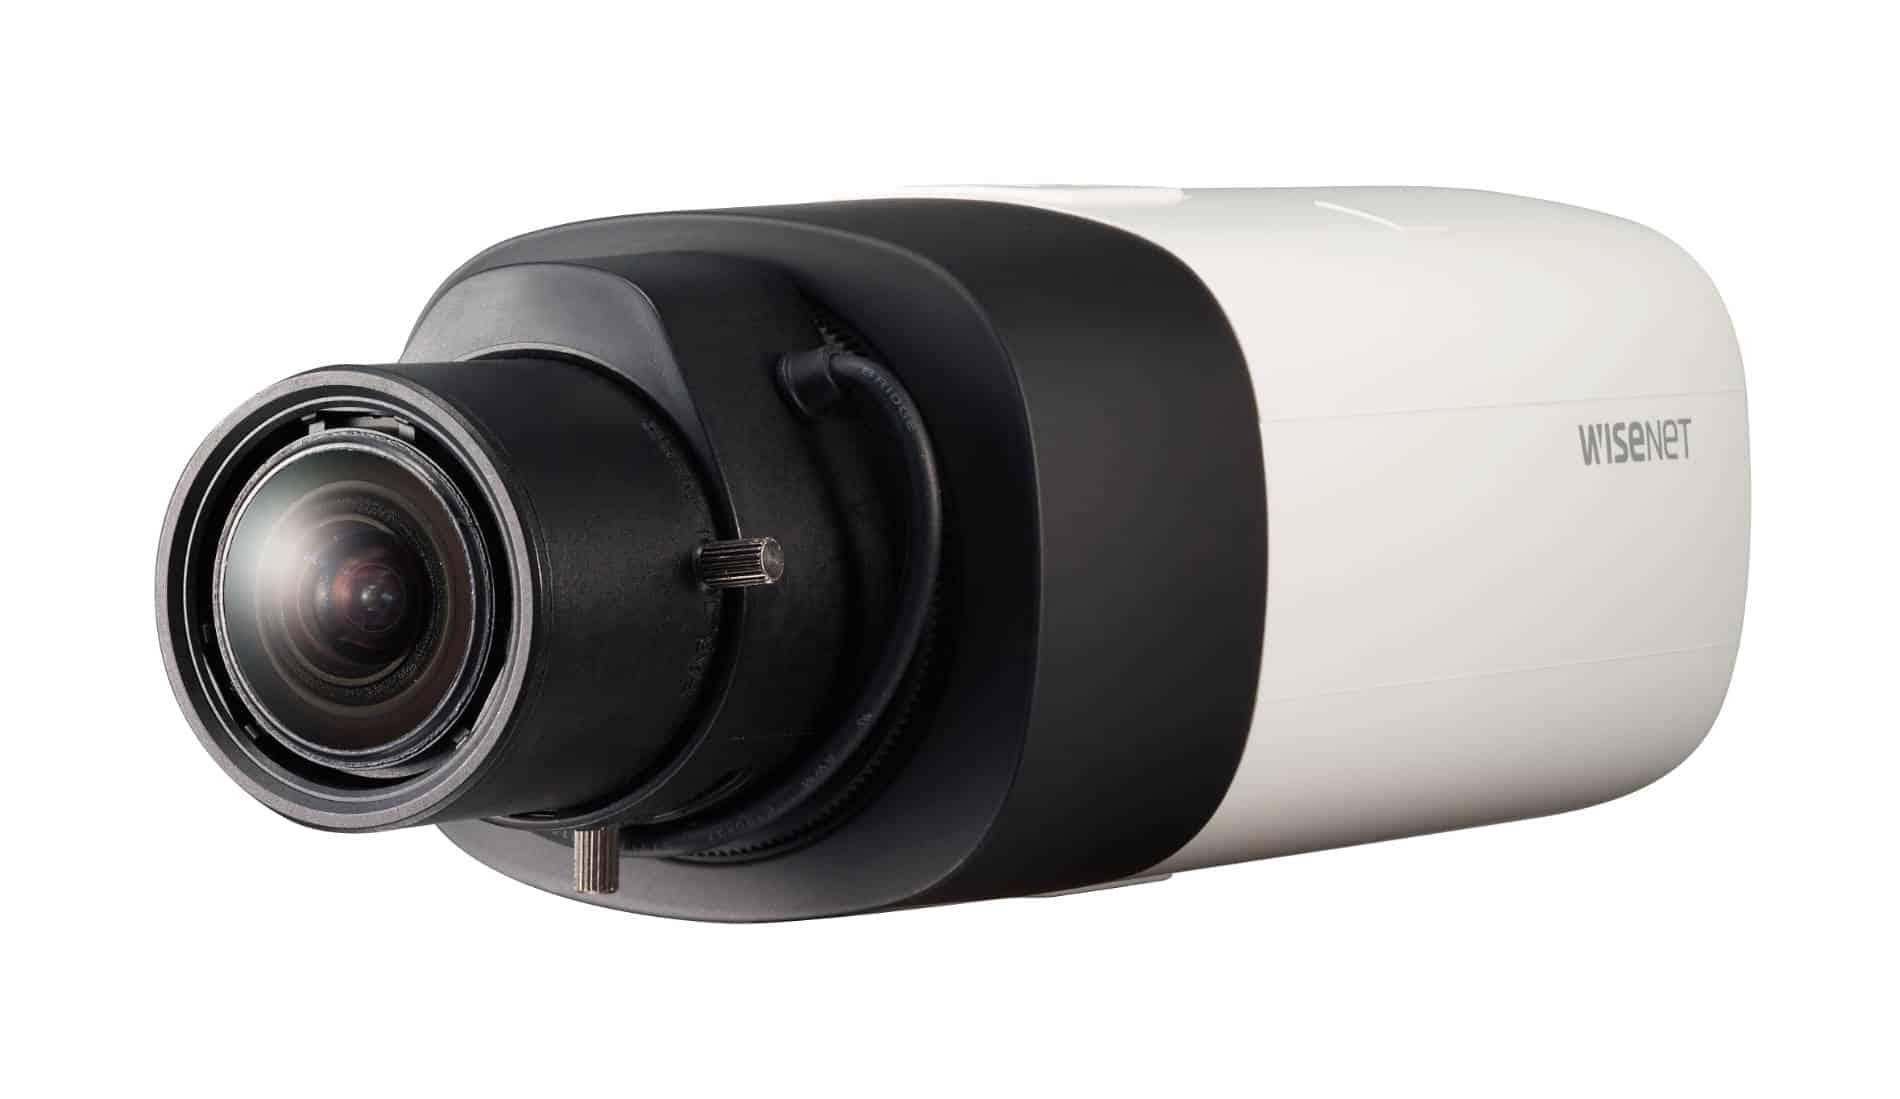 XNB-6005 2M H.265 NW Box Camera (extraLUX)